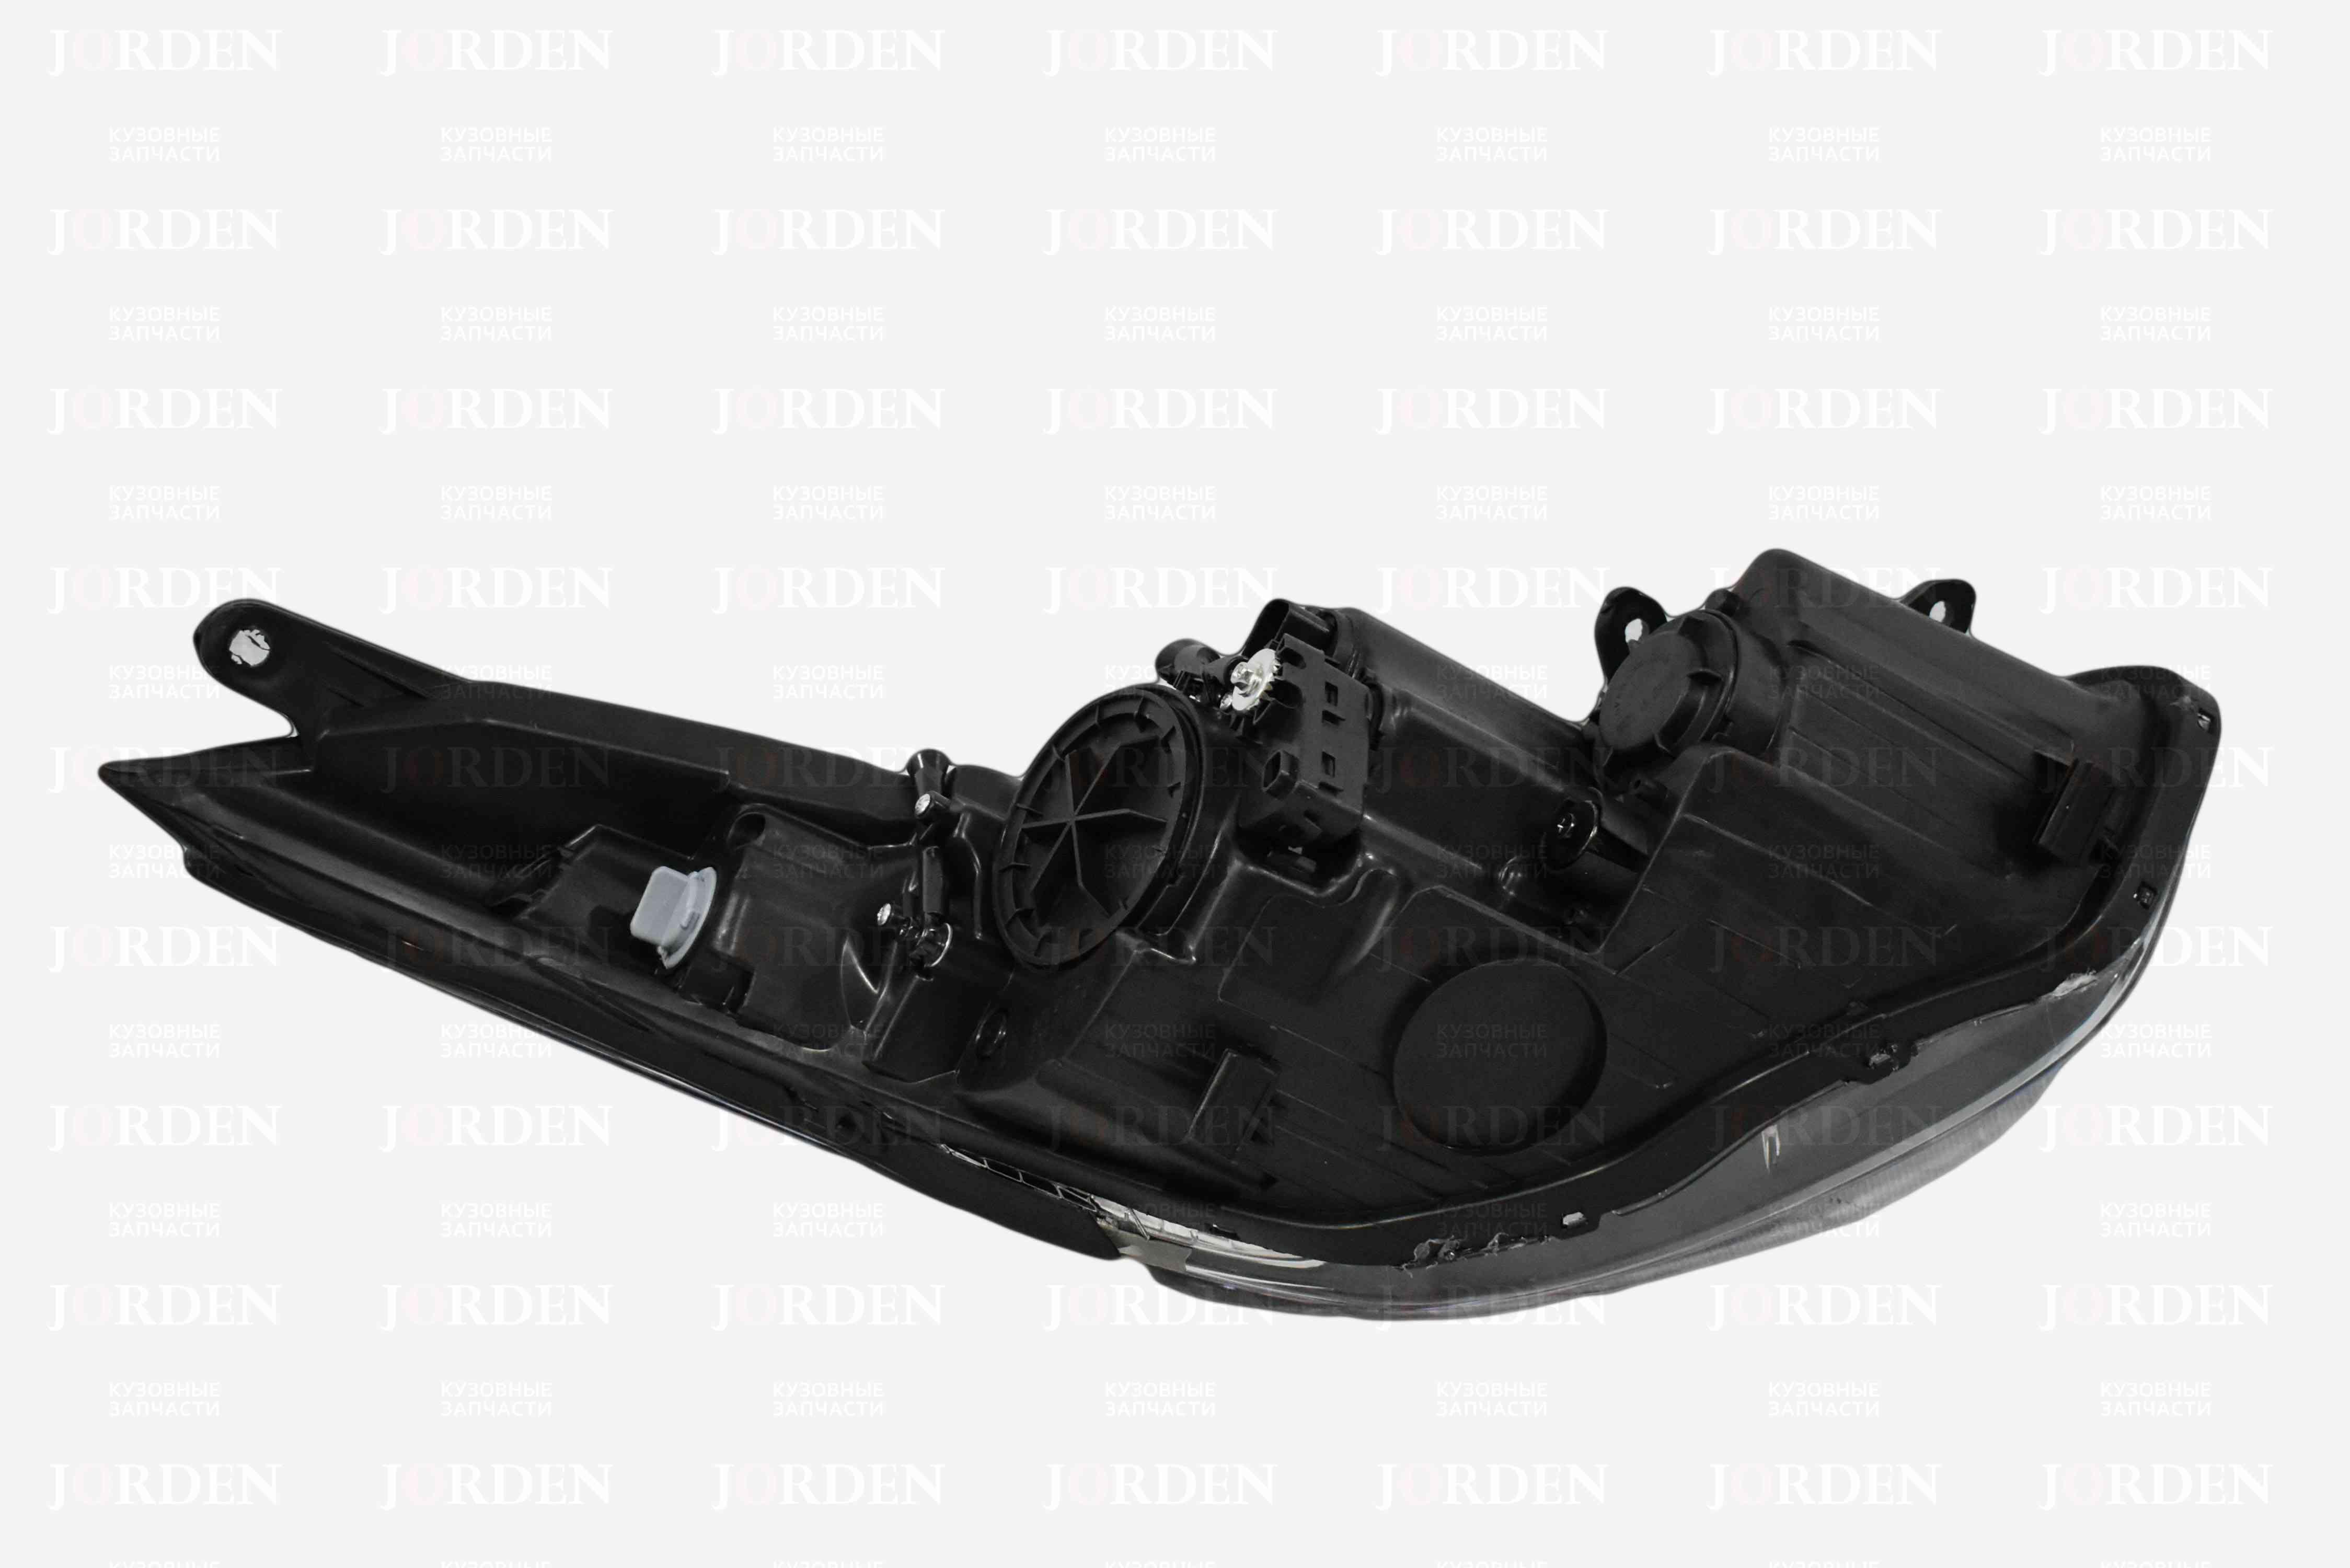 Фара под эл./кор Hyundai Elantra 14-16 LH Левая (JH02-ELT13-001-L / HNAVA14-000-L)